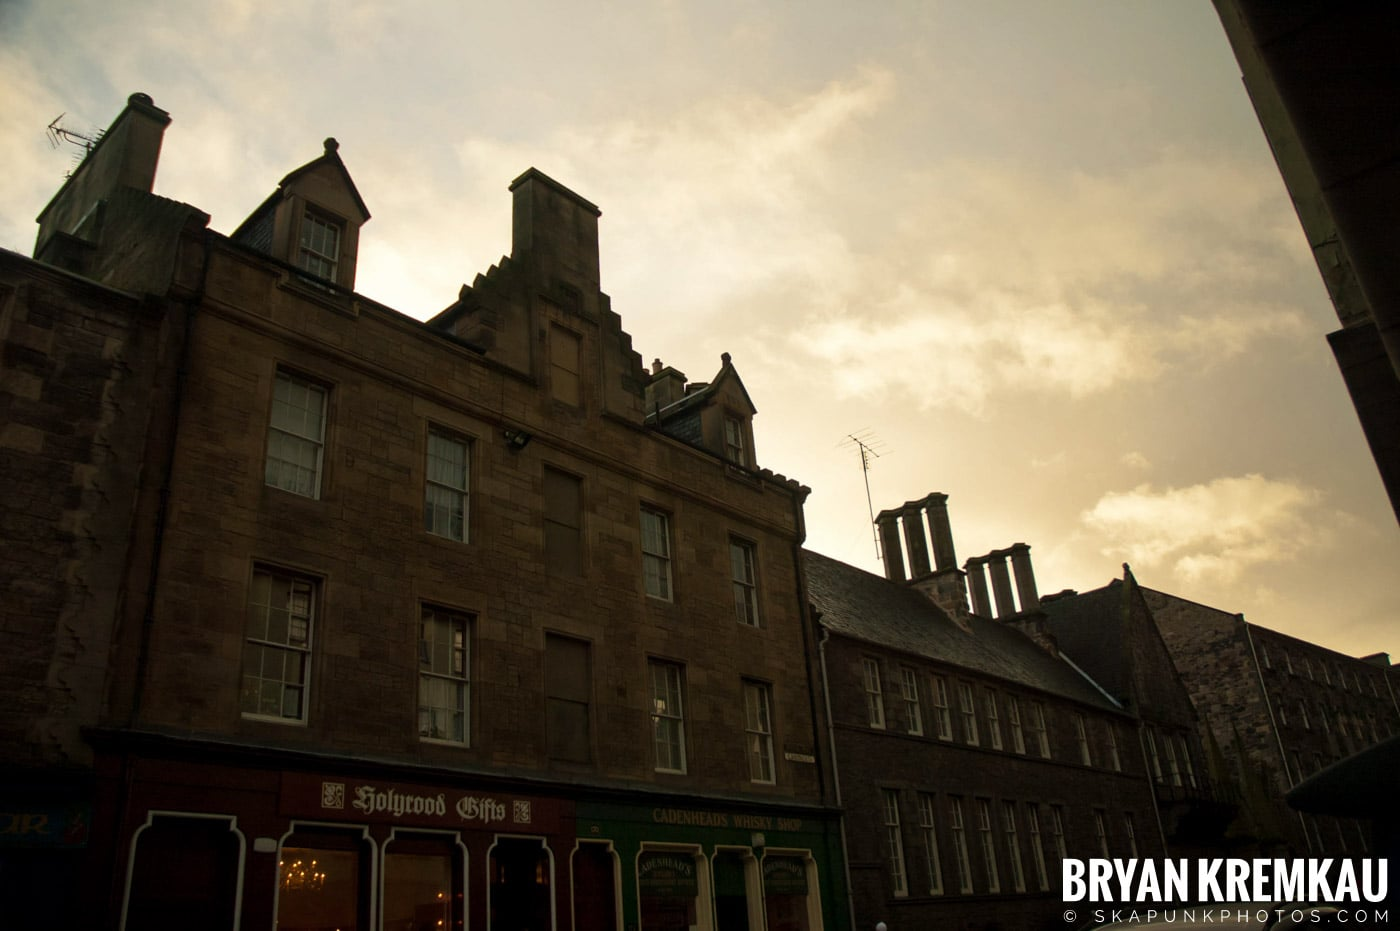 Edinburgh, Scotland - Day 1 - 12.12.06 (27)